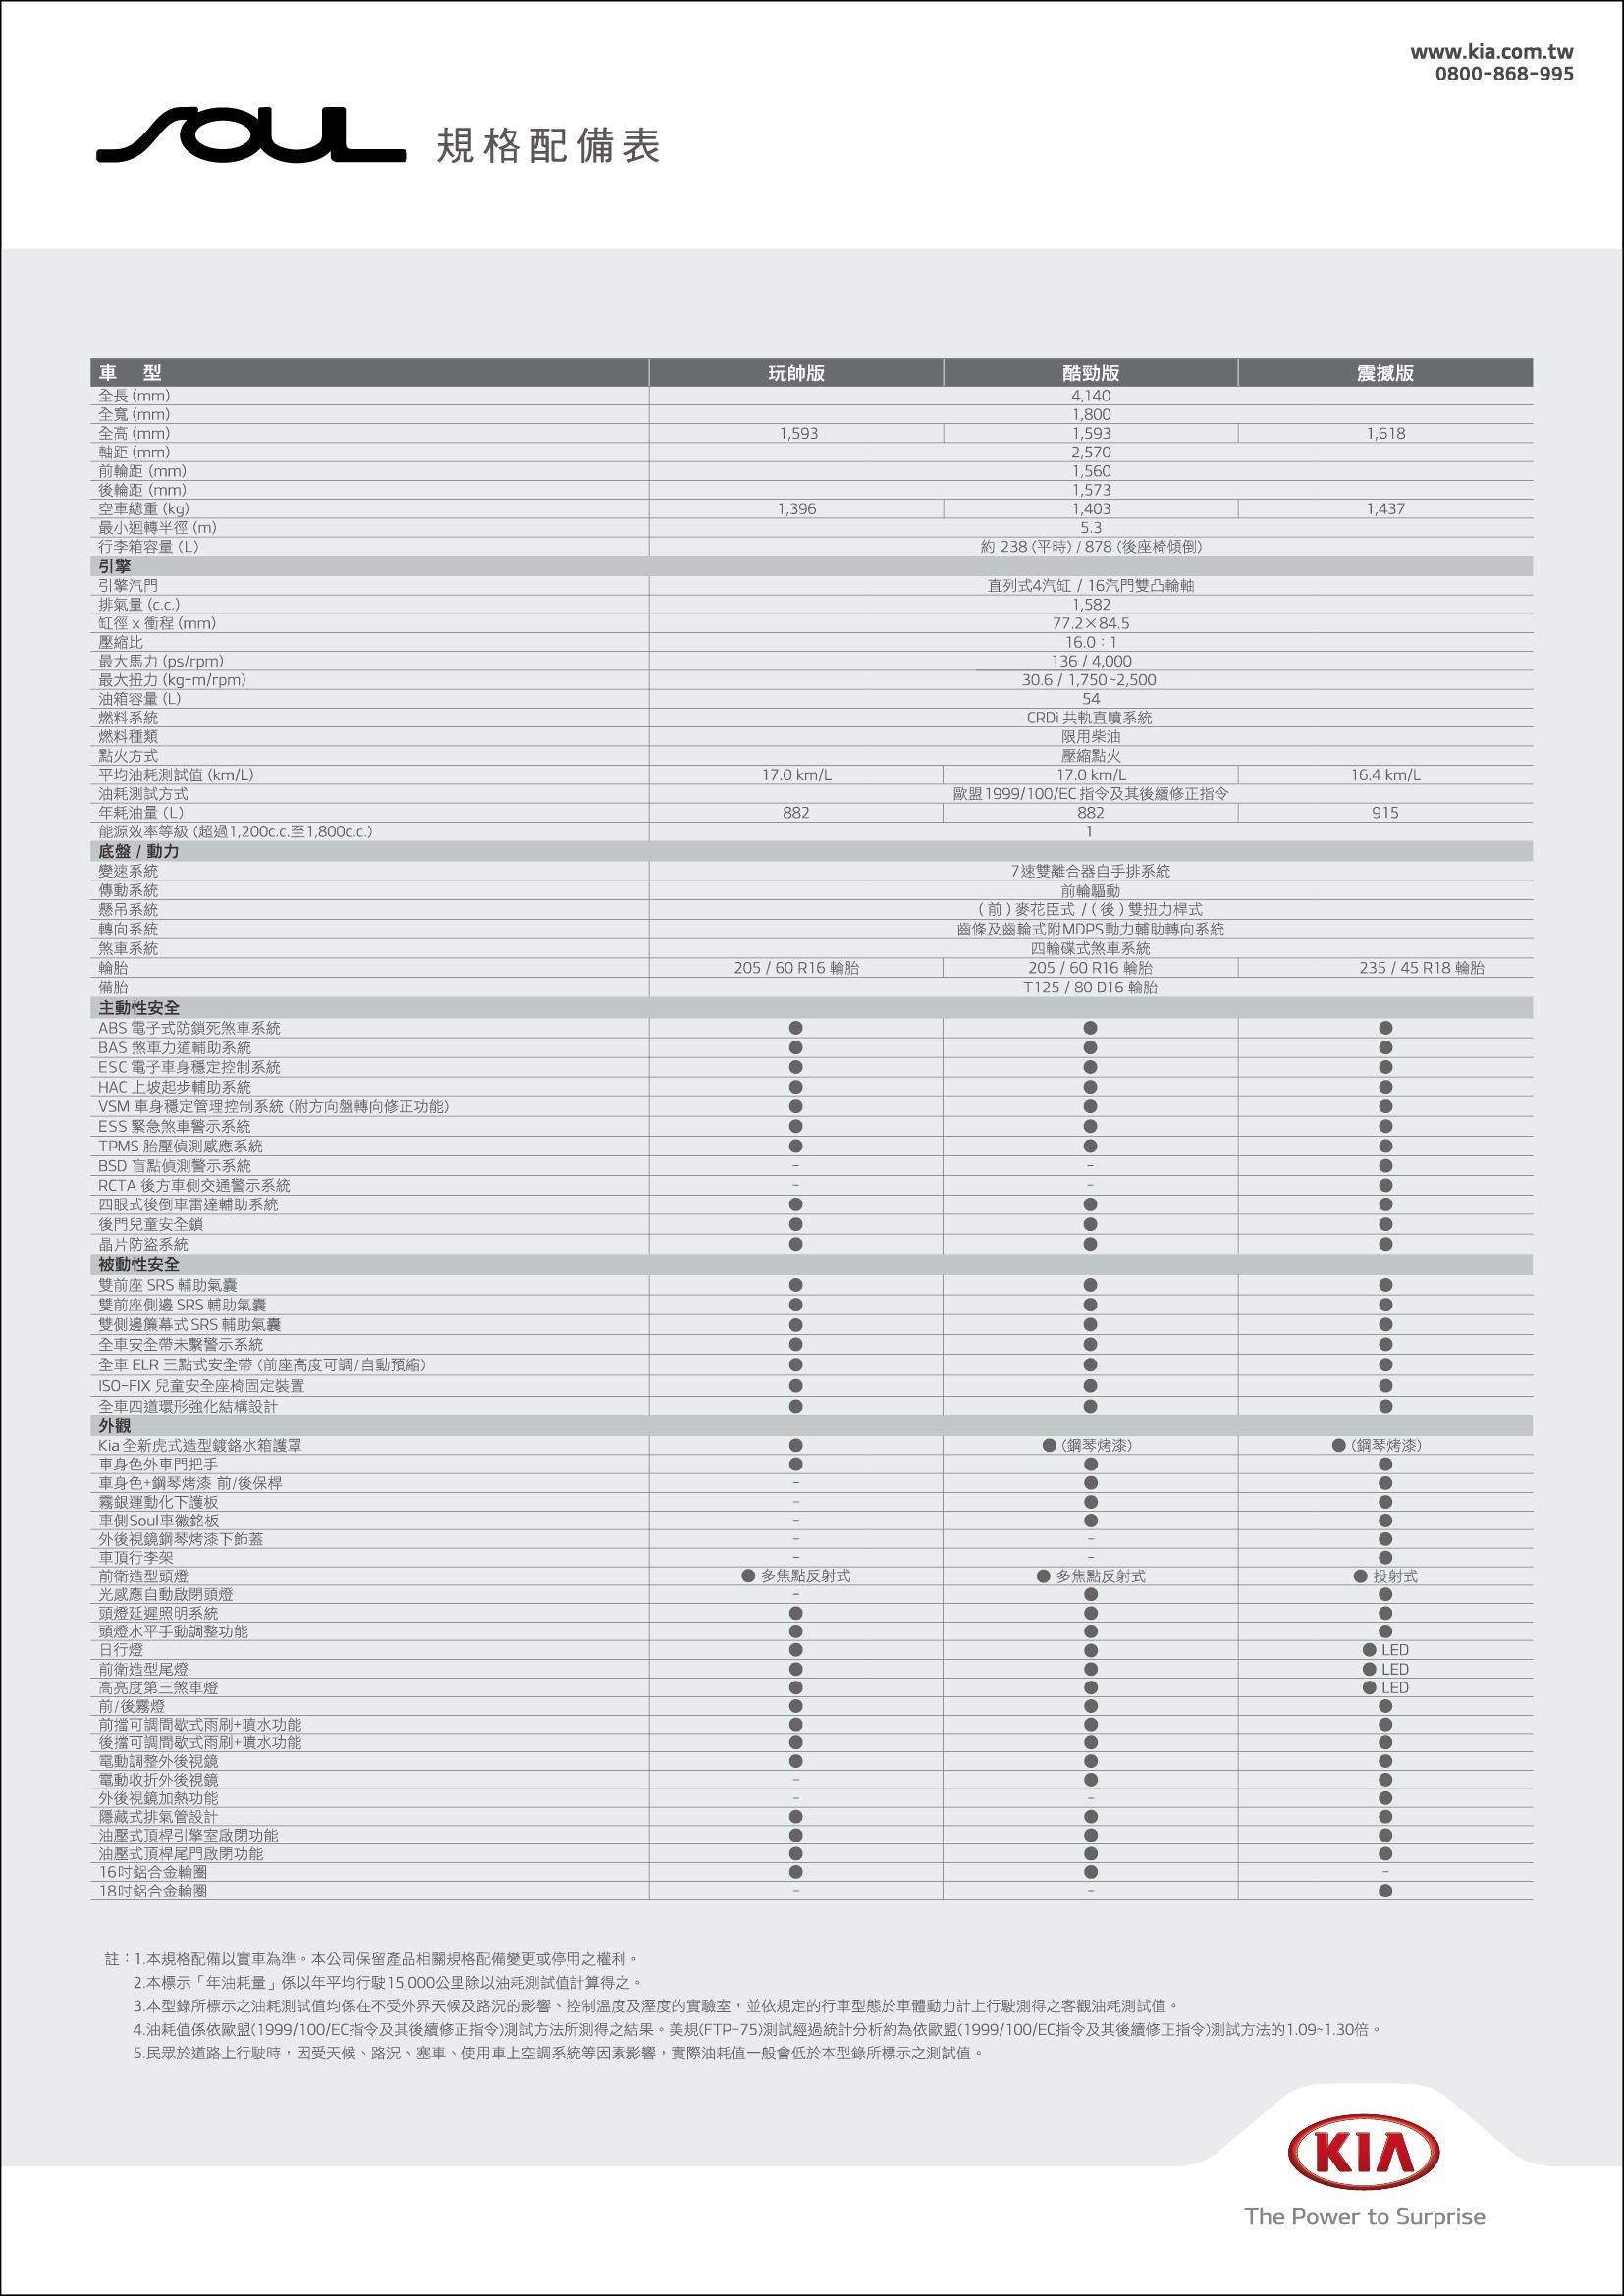 Sportage-規配表-有價錢